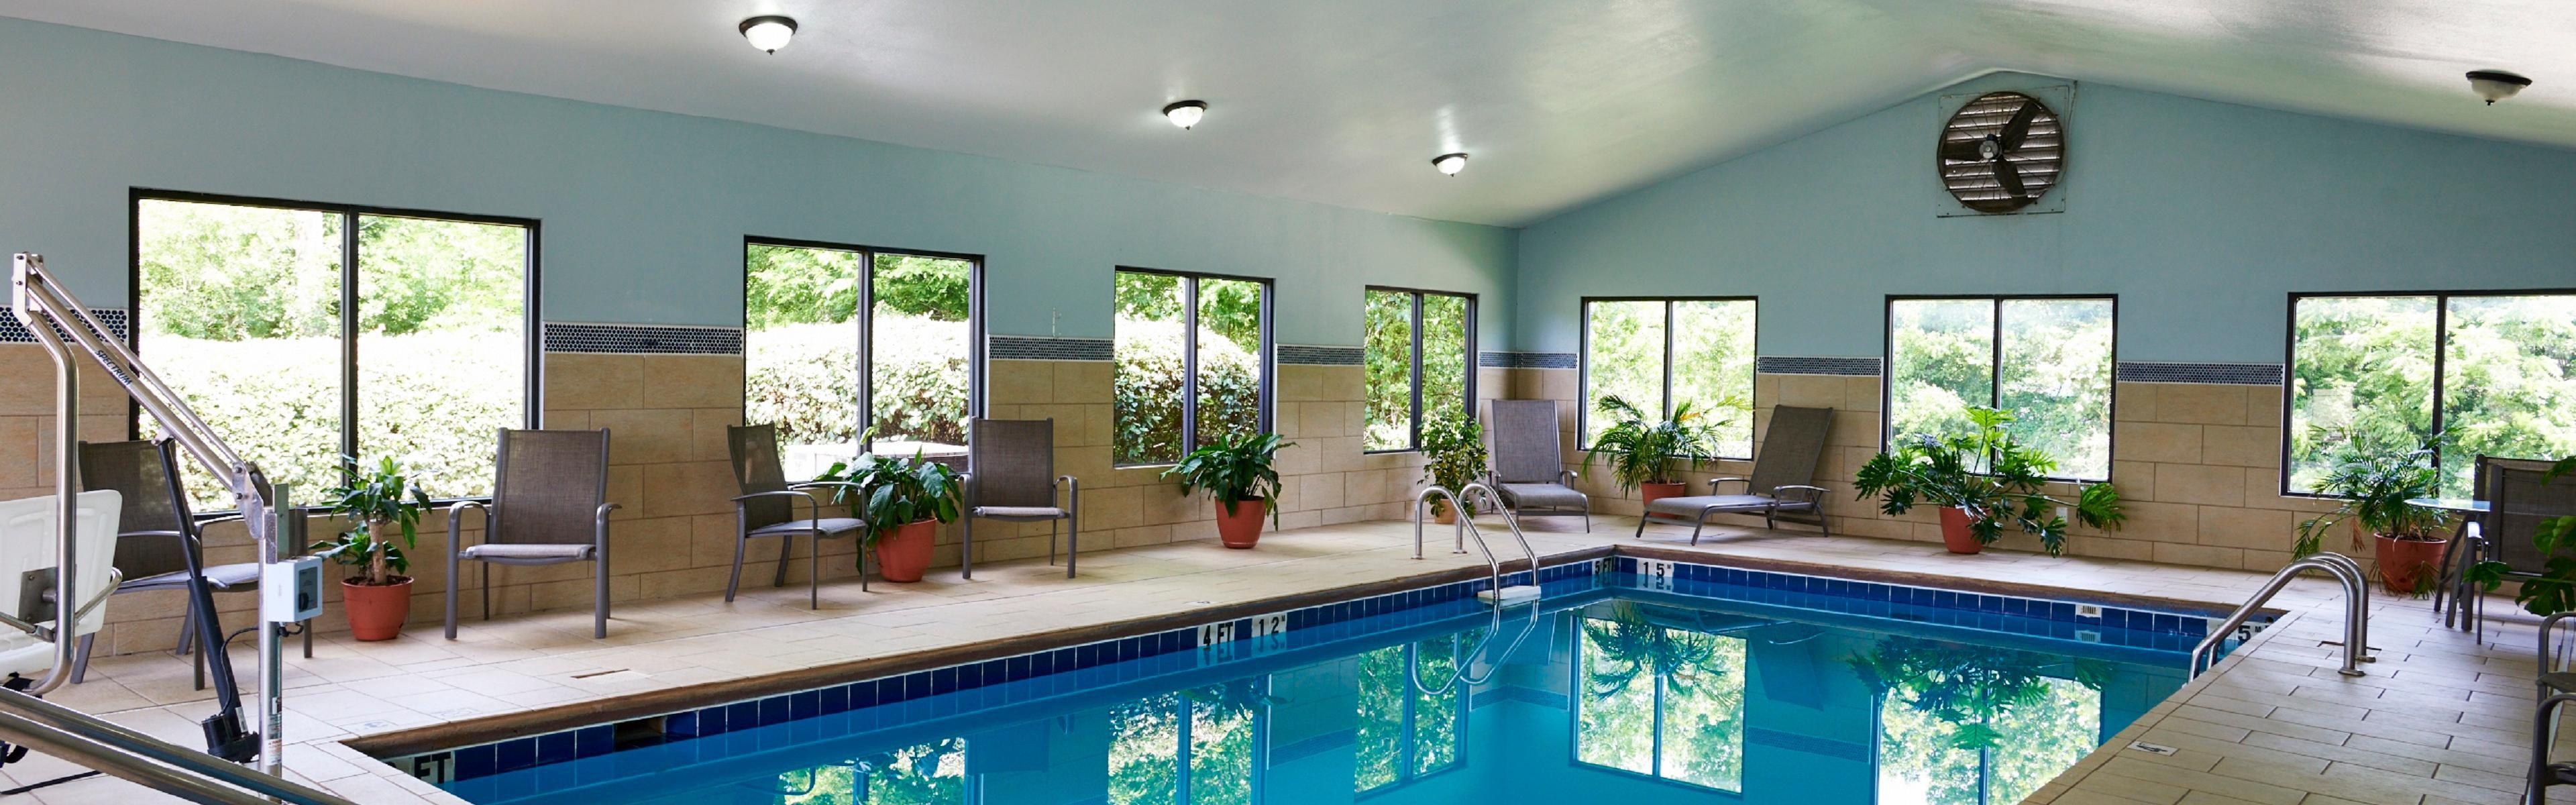 Holiday Inn Express & Suites Birmingham South - Pelham image 2